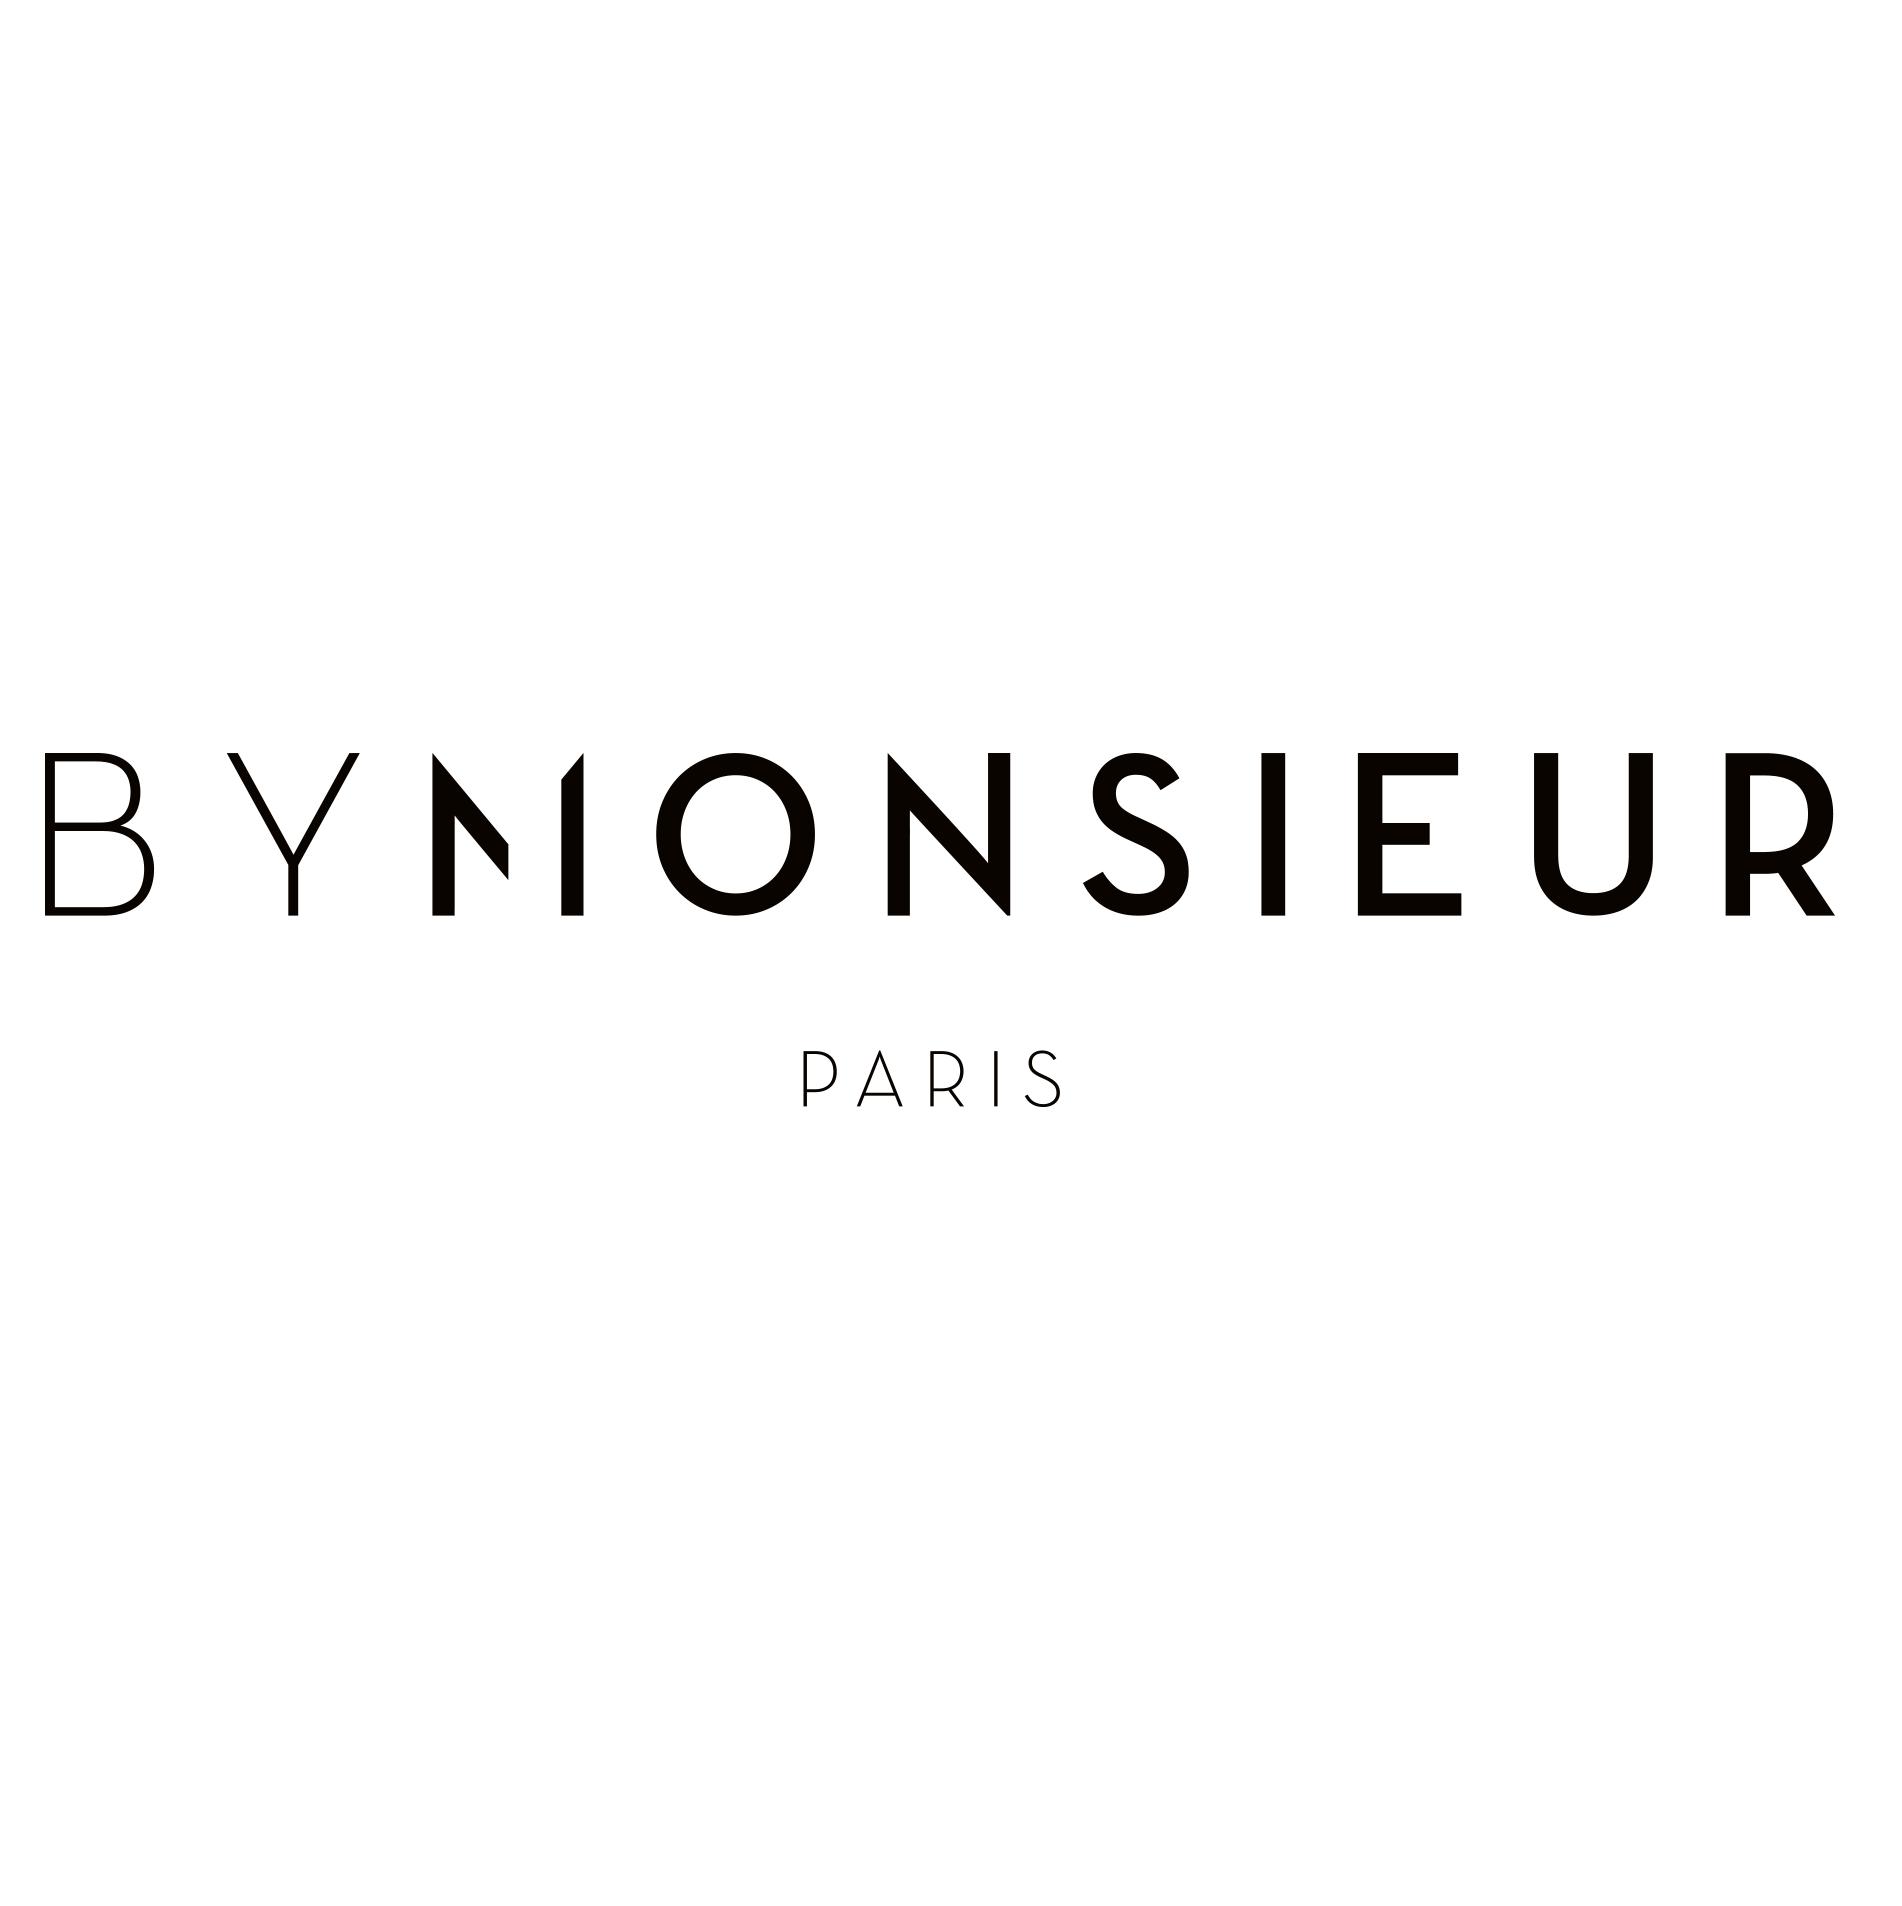 bymonsieur-logo noir pour blanc